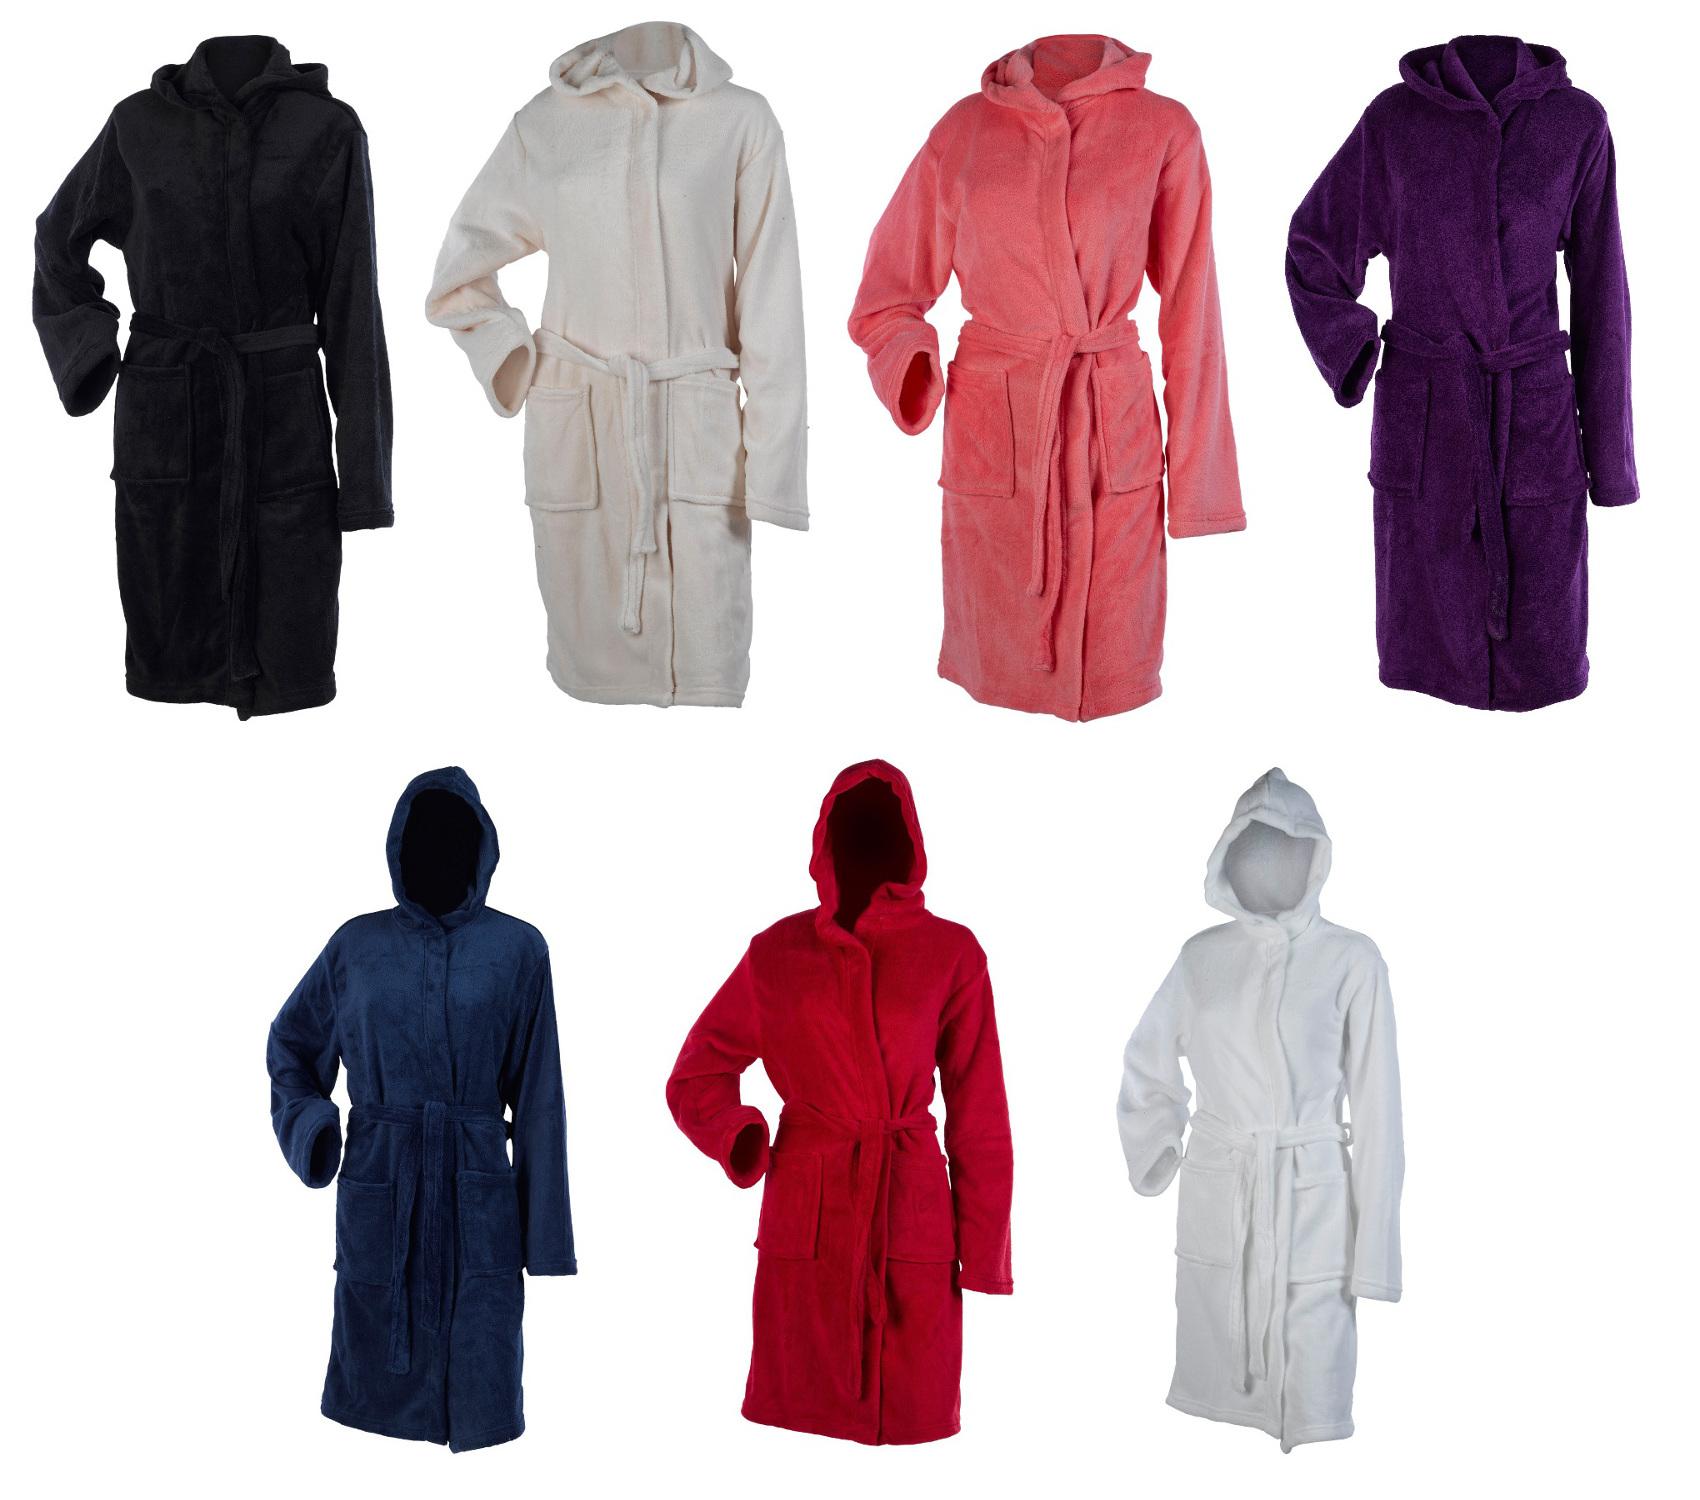 Details about Womens Hooded Wrap Around Dressing Gown Soft Coral Fleece  Plain Bathrobe Medium 623a82f3c